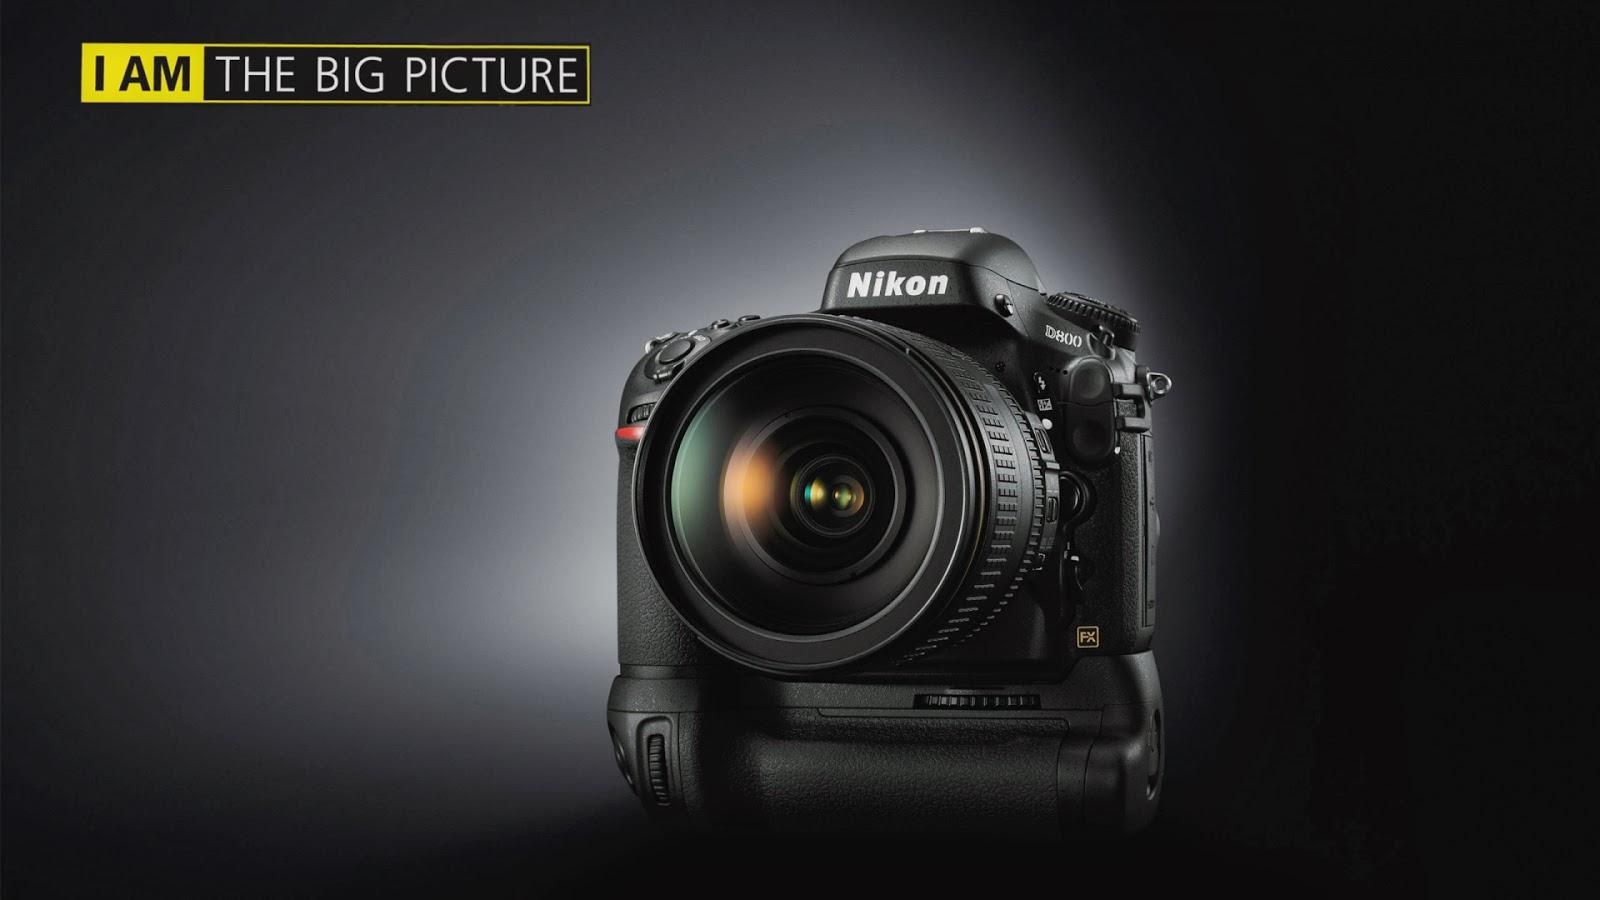 photography camera nikon wallpaper - photo #34